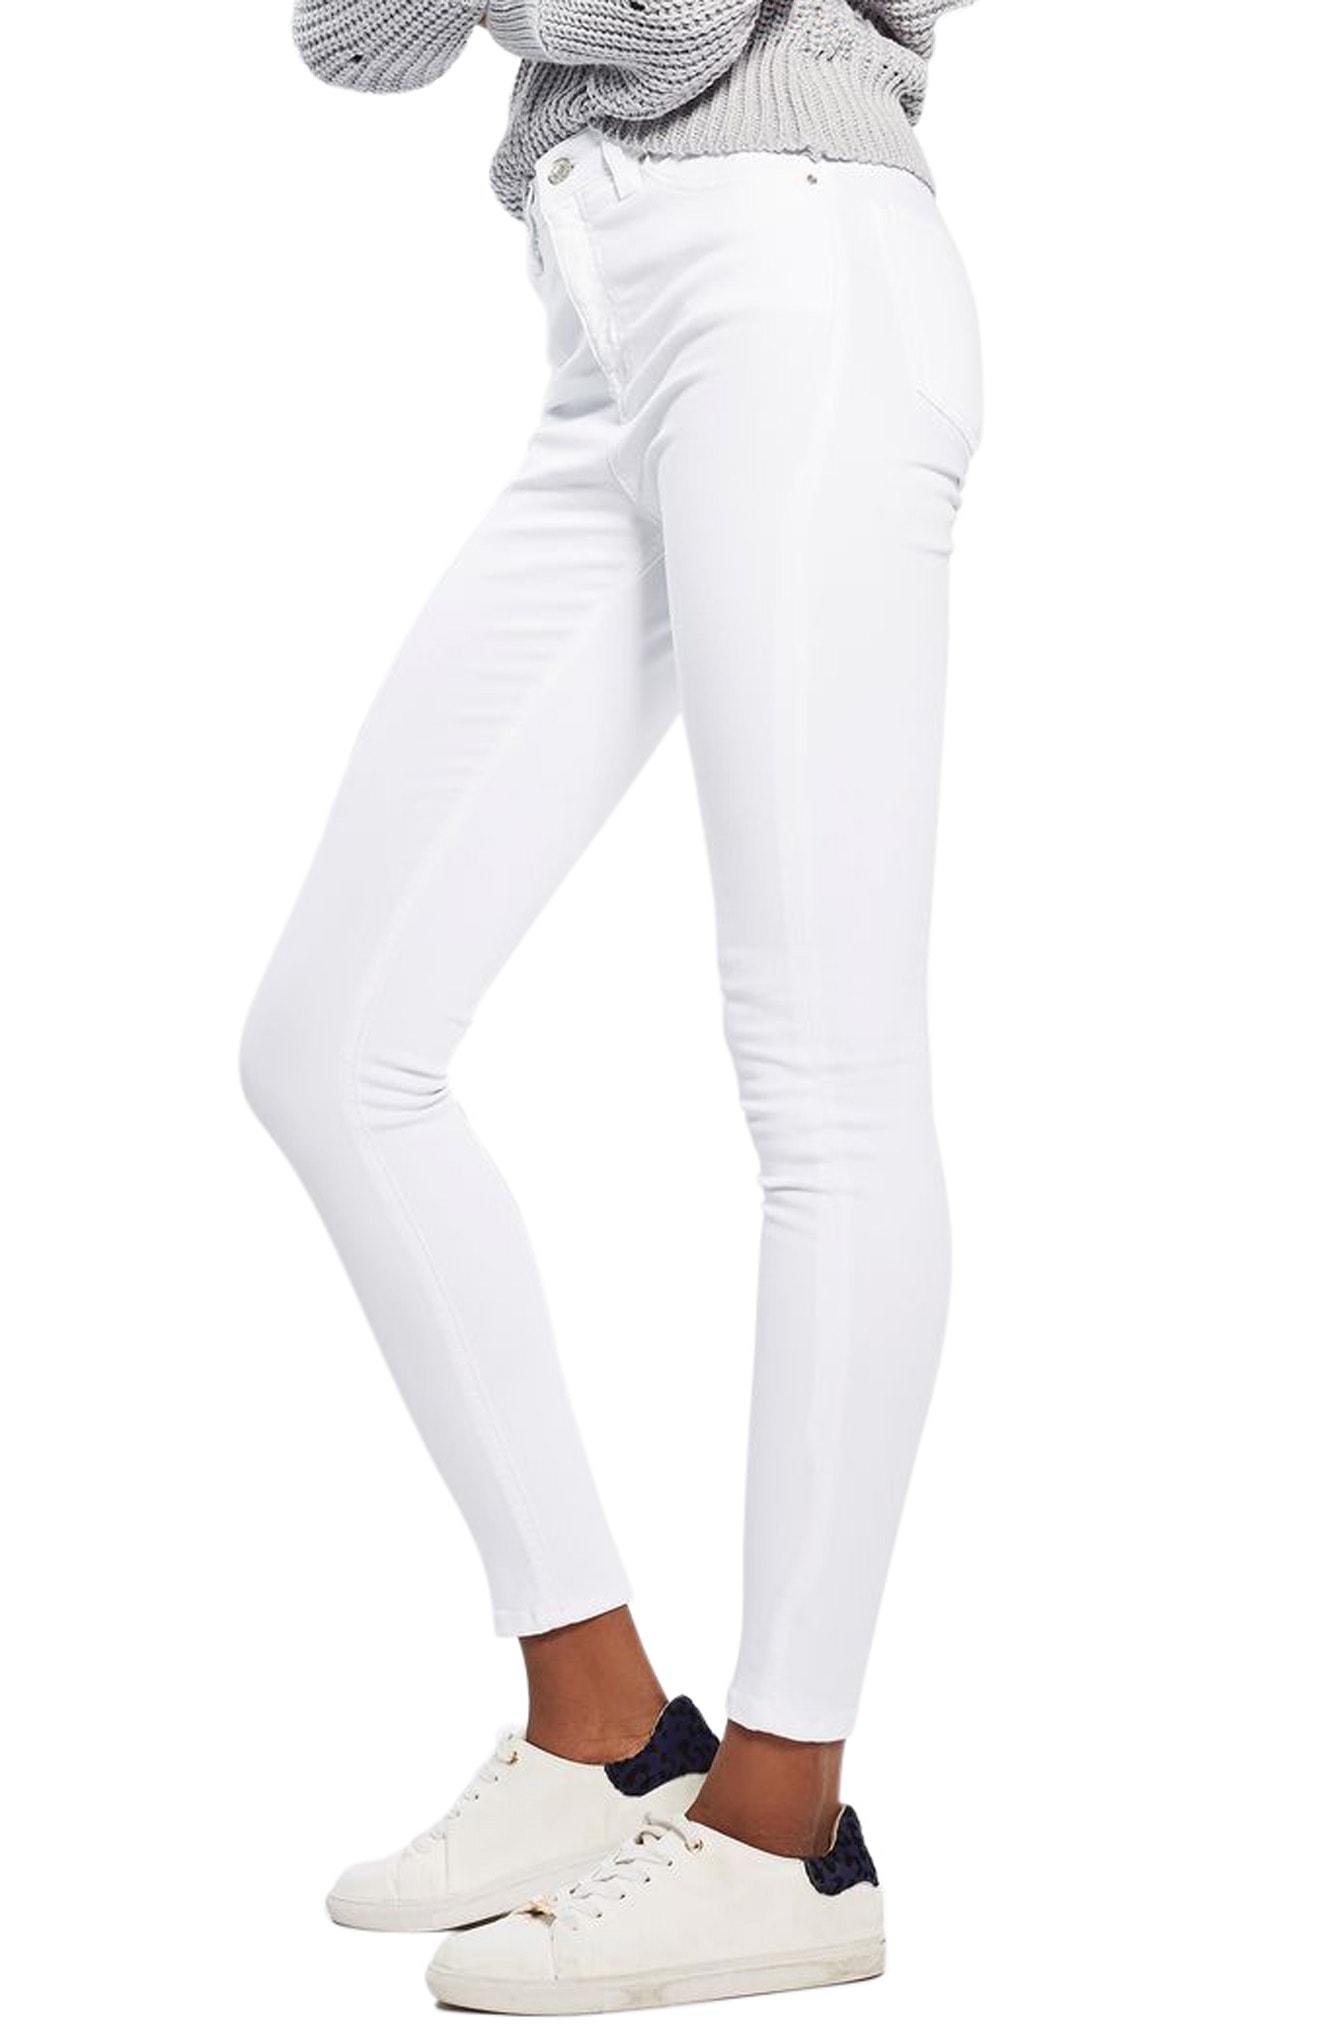 Women's Skinny Jeans | Nordstrom